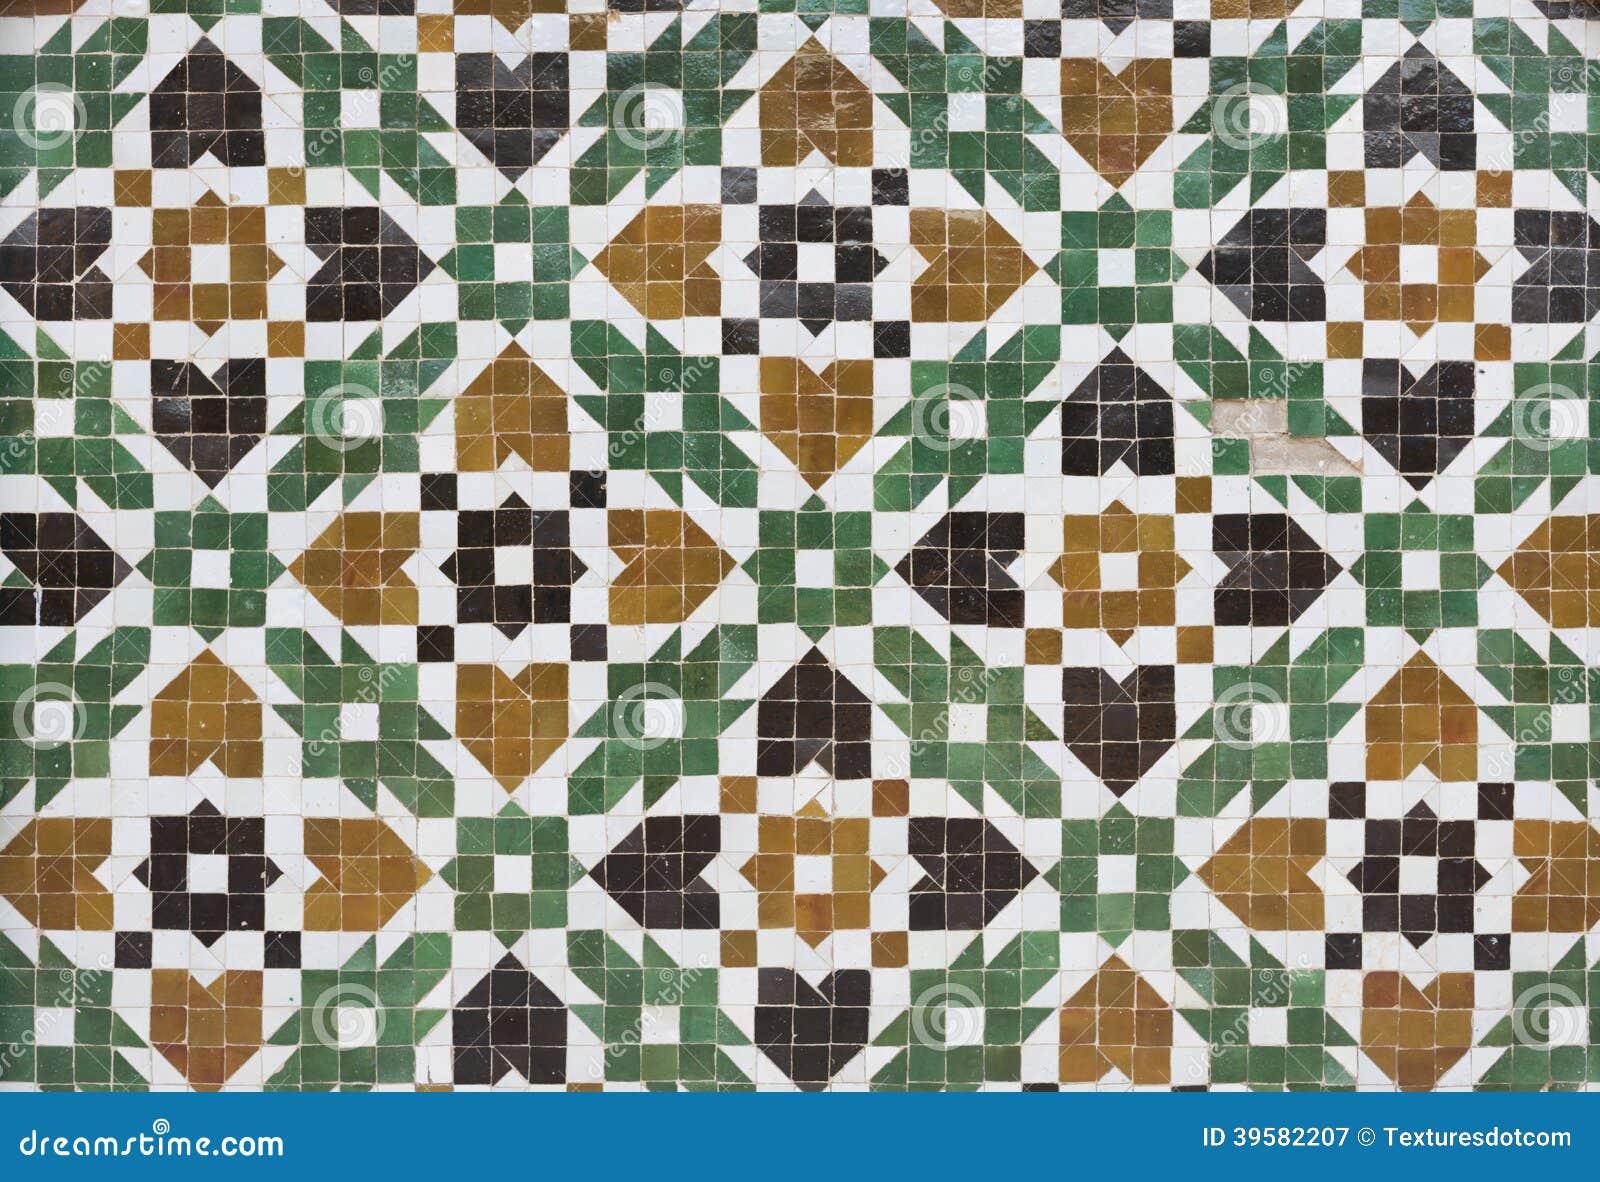 Moroccan zellige tile stock image image of mosaic tile